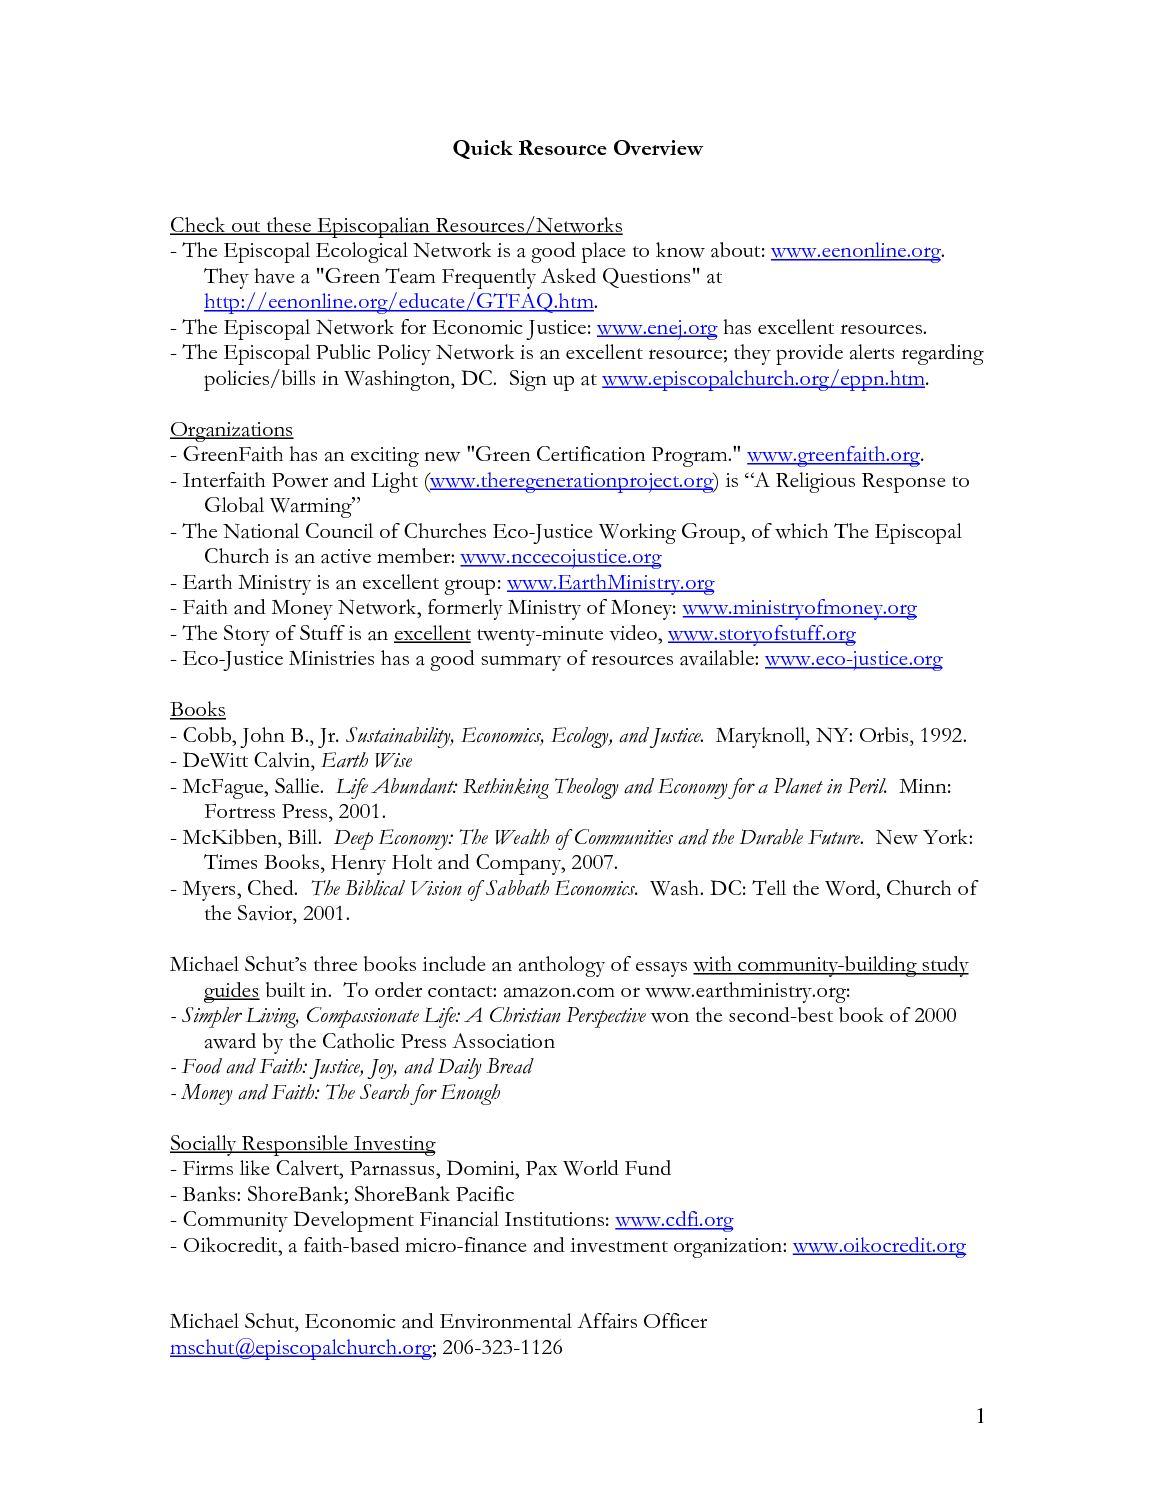 Calaméo - Quick Resource Overview